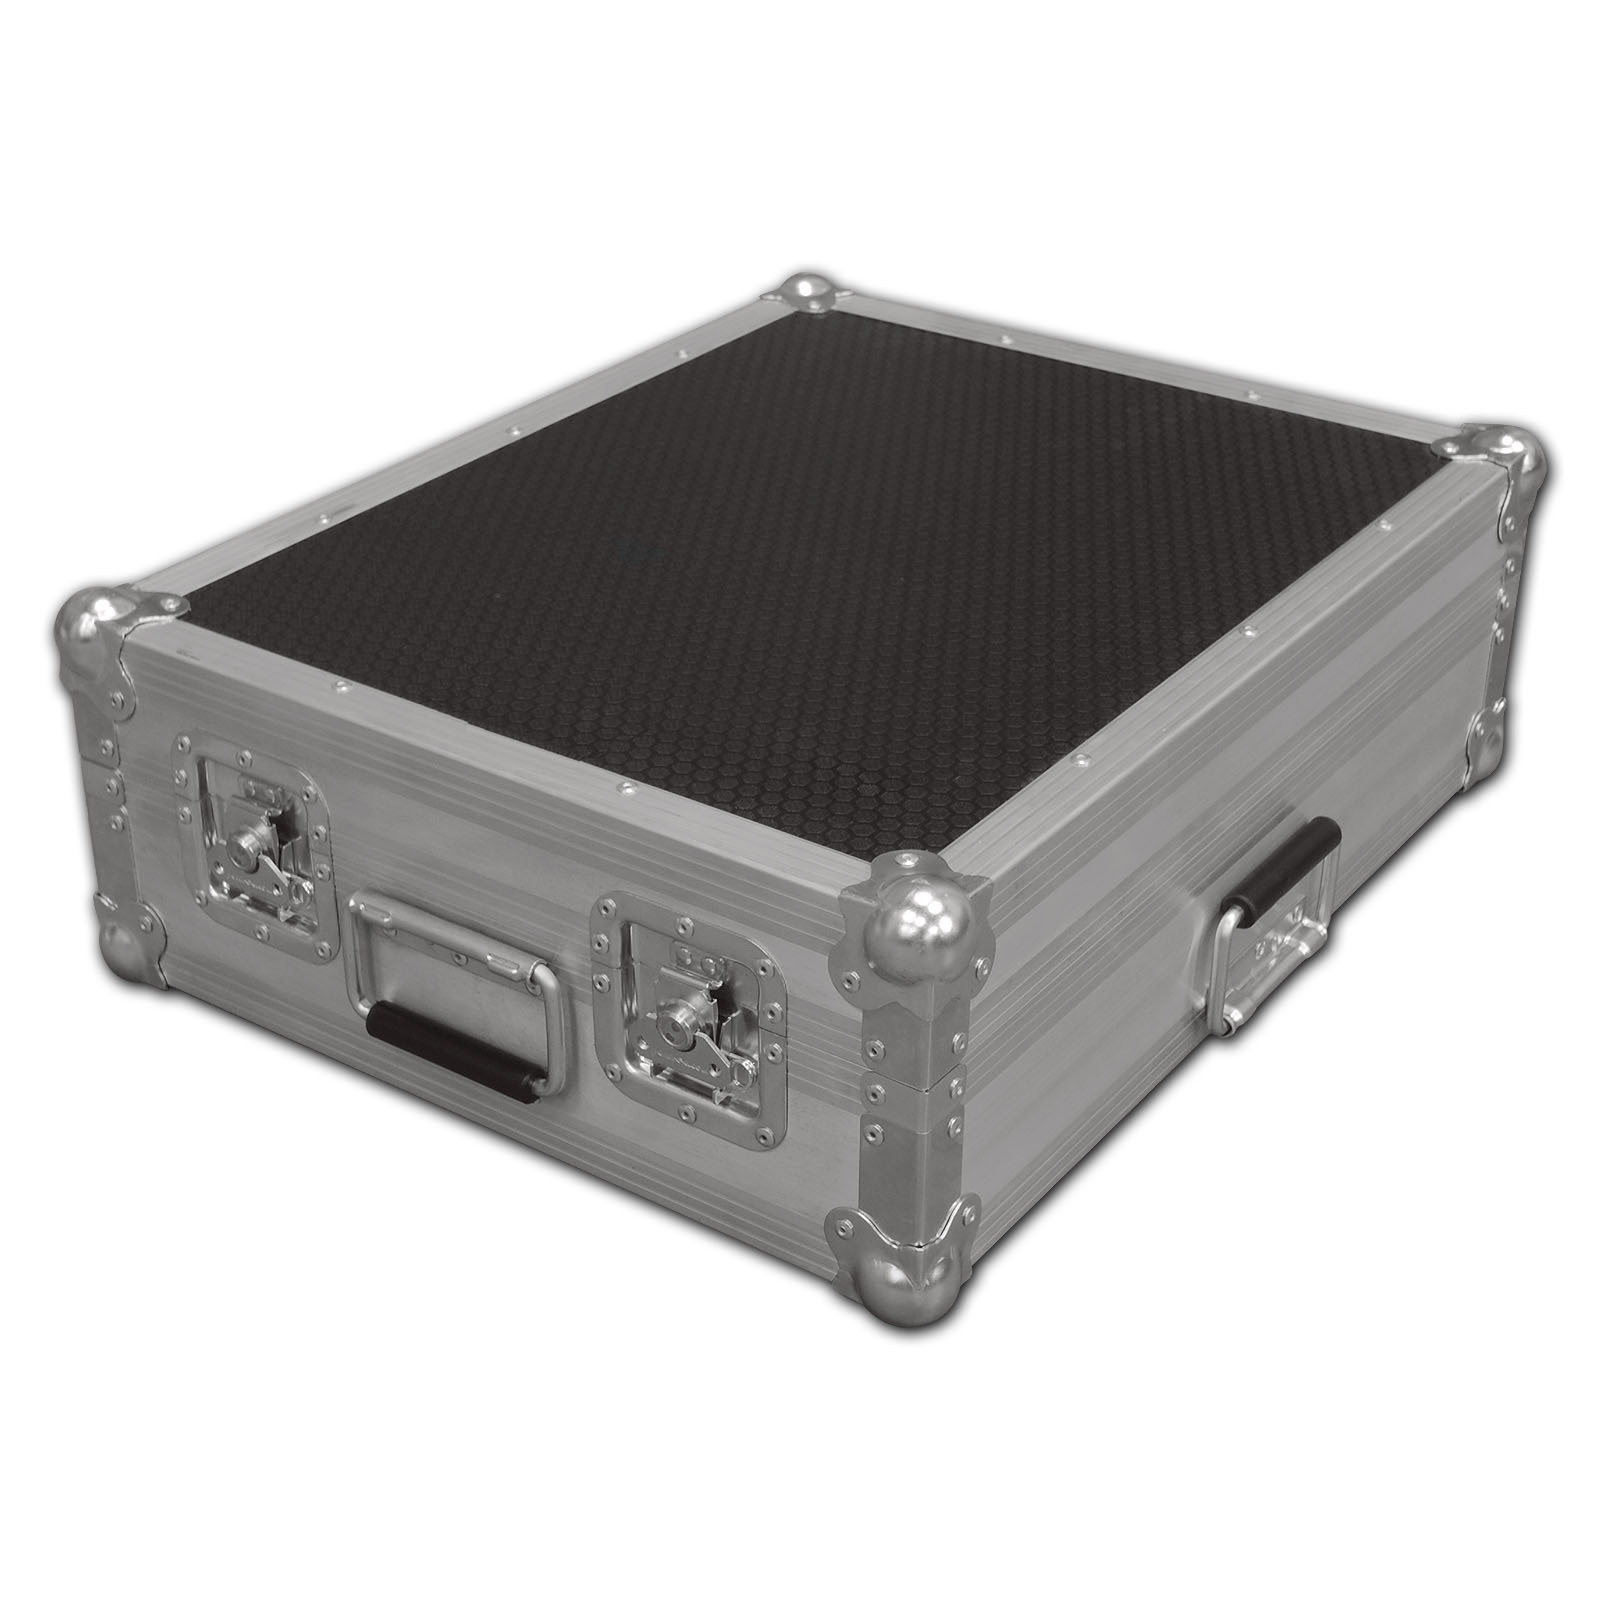 mackie profx12 mixer flight case. Black Bedroom Furniture Sets. Home Design Ideas